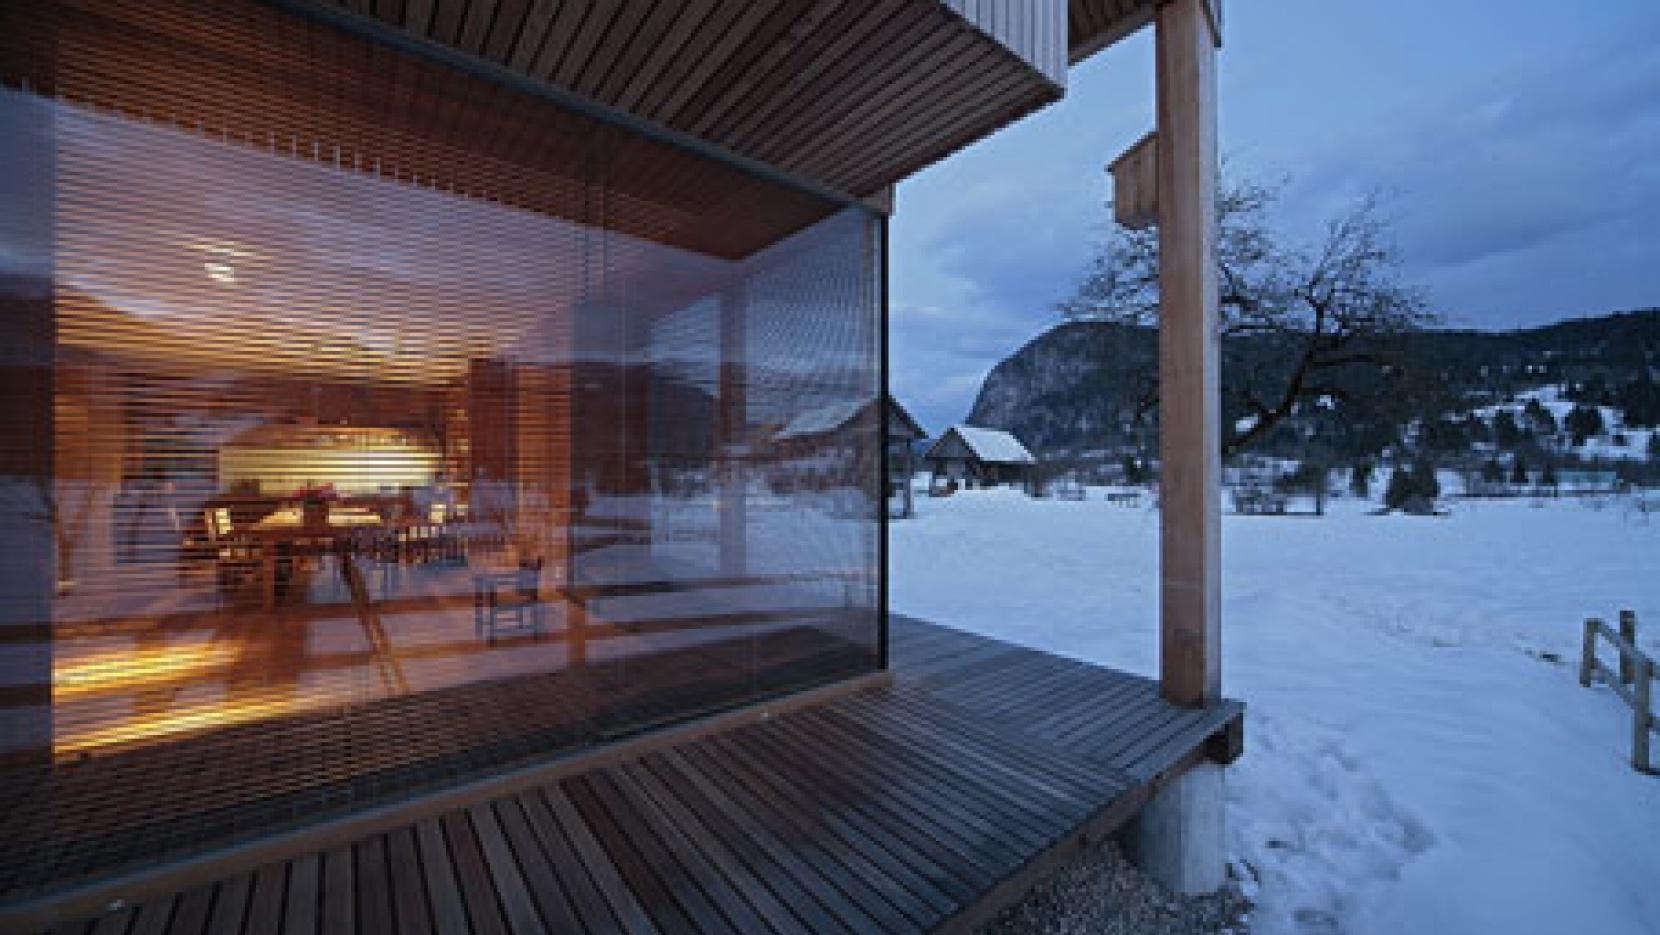 6x11 Alpine Hut Ofis Architects Yatzer